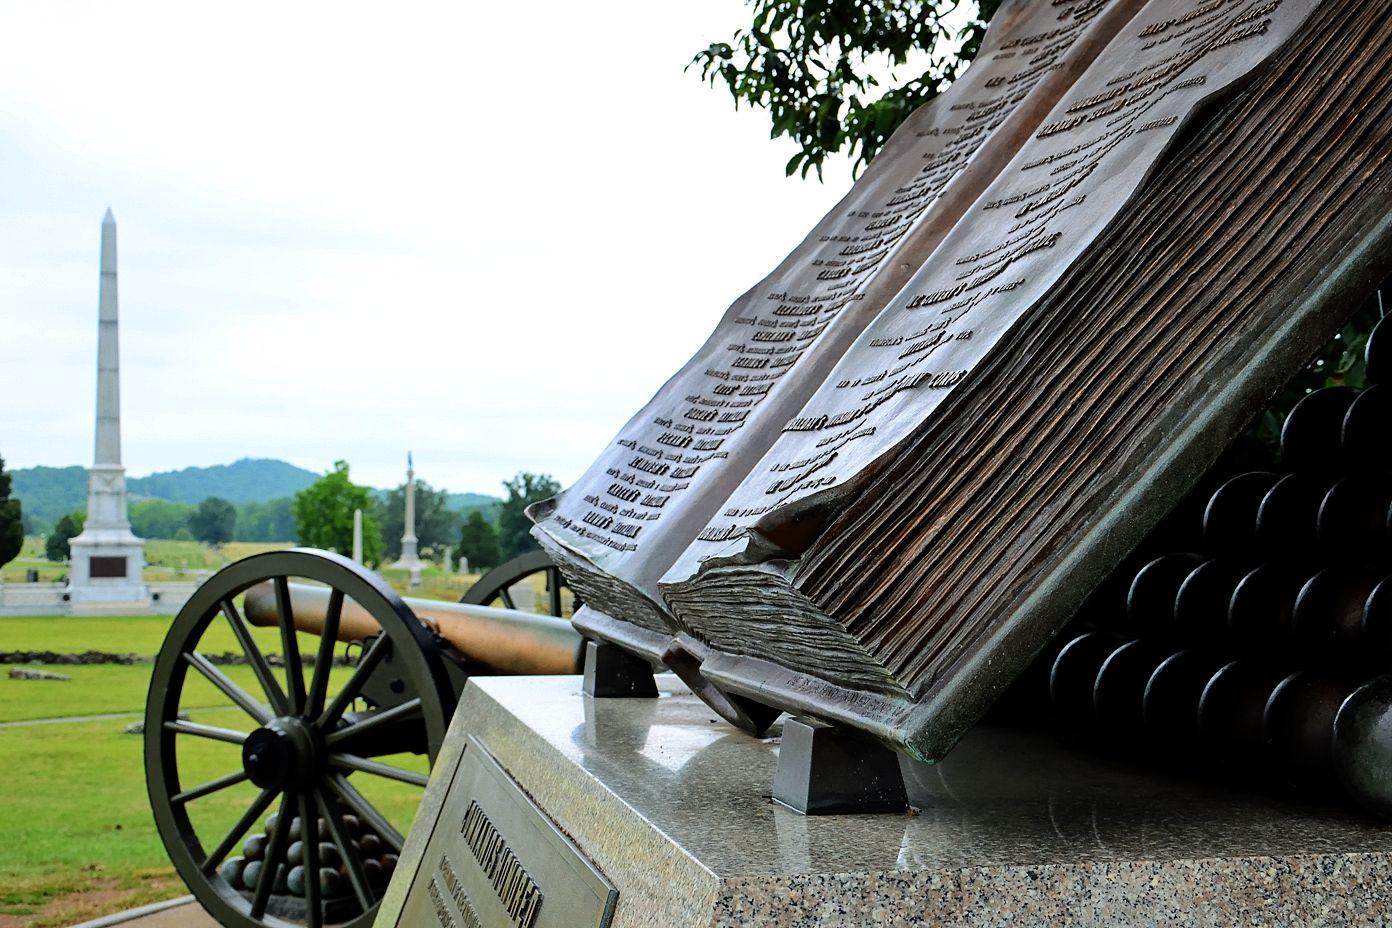 Gettysburg Favorite places, Gettysburg, Cannon